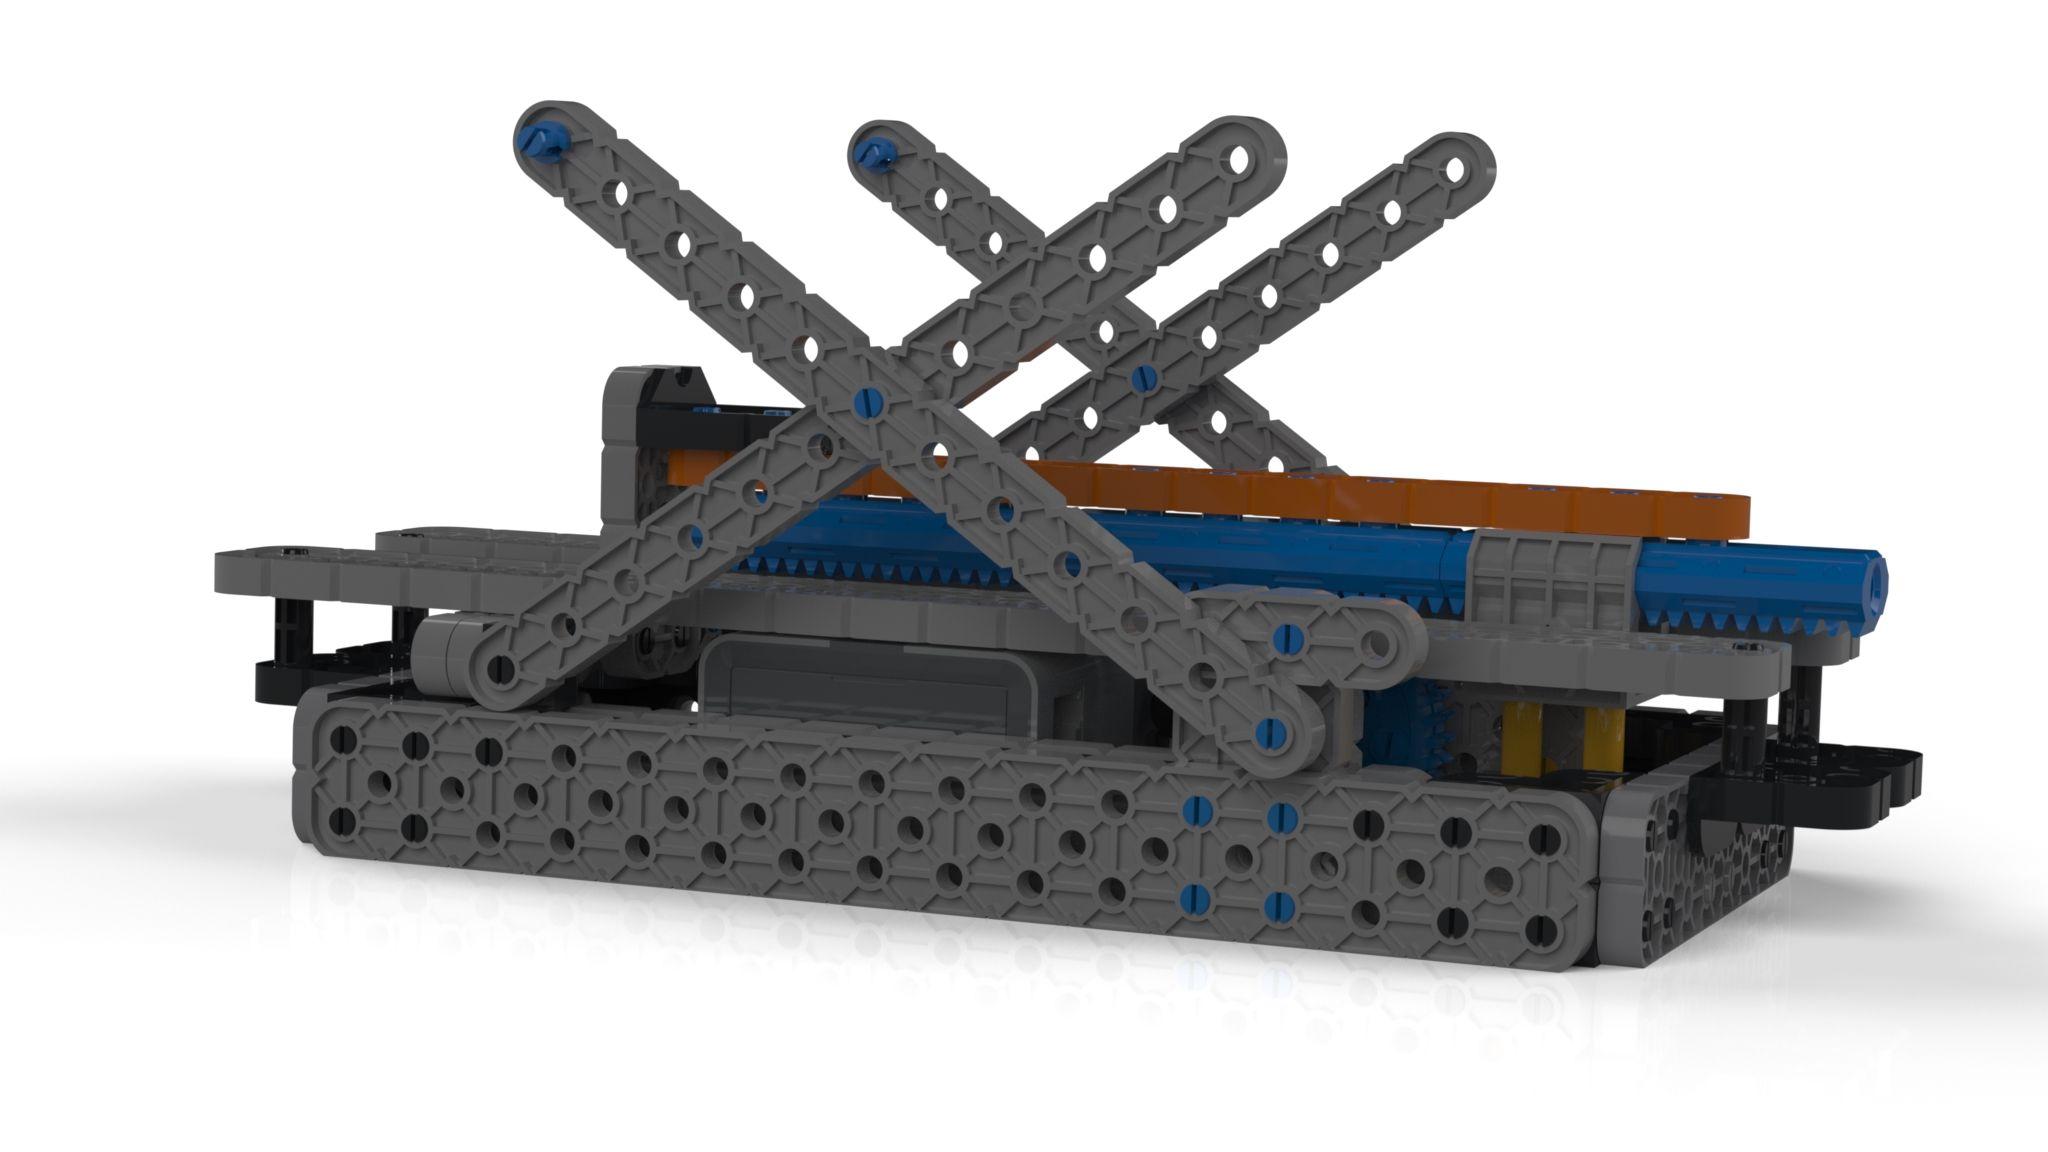 Vex-iq-elevation-mechanics-lcs---fabrica-de-nerdes-04-3500-3500